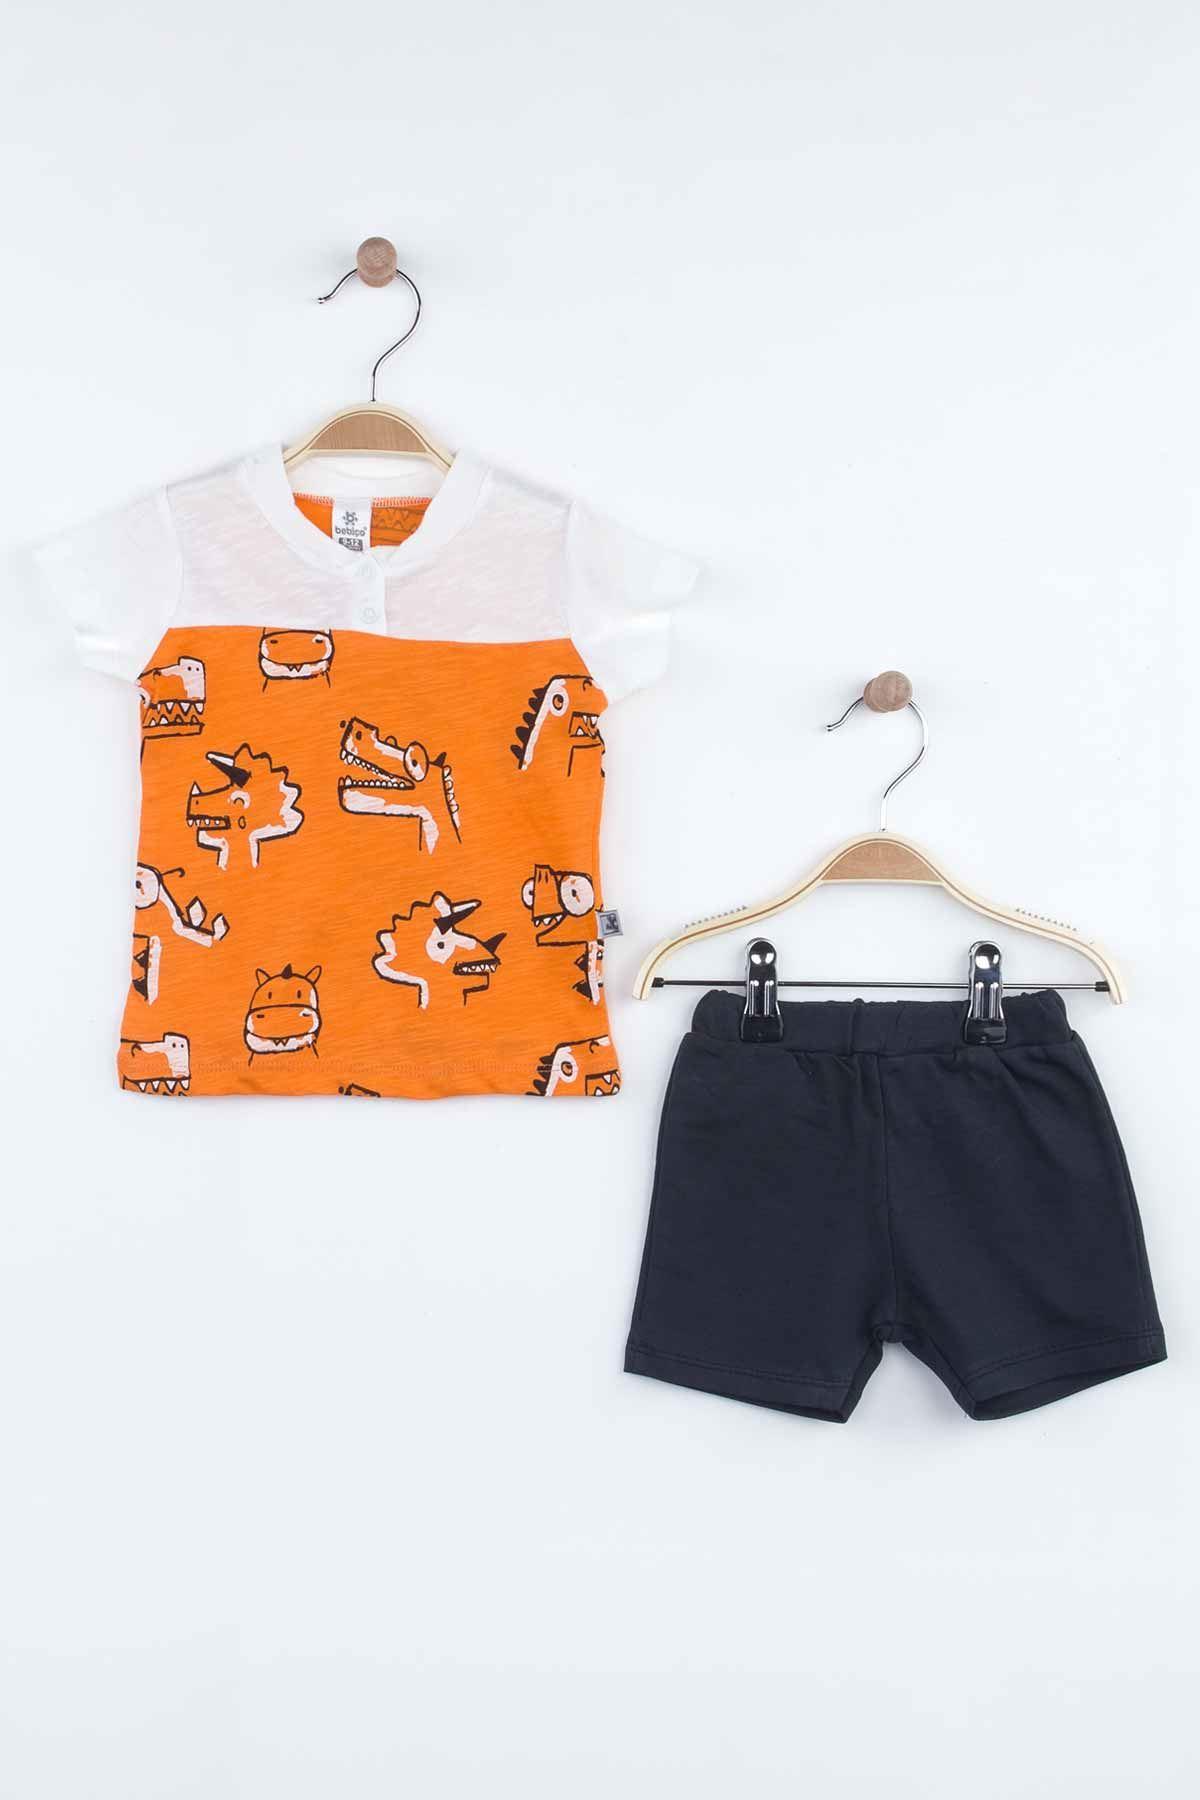 Orange Baby Boy Shorts Set Summer 2021 Fashion Babies Boys Outfit Cotton Casual Vacation Use Clothing Models